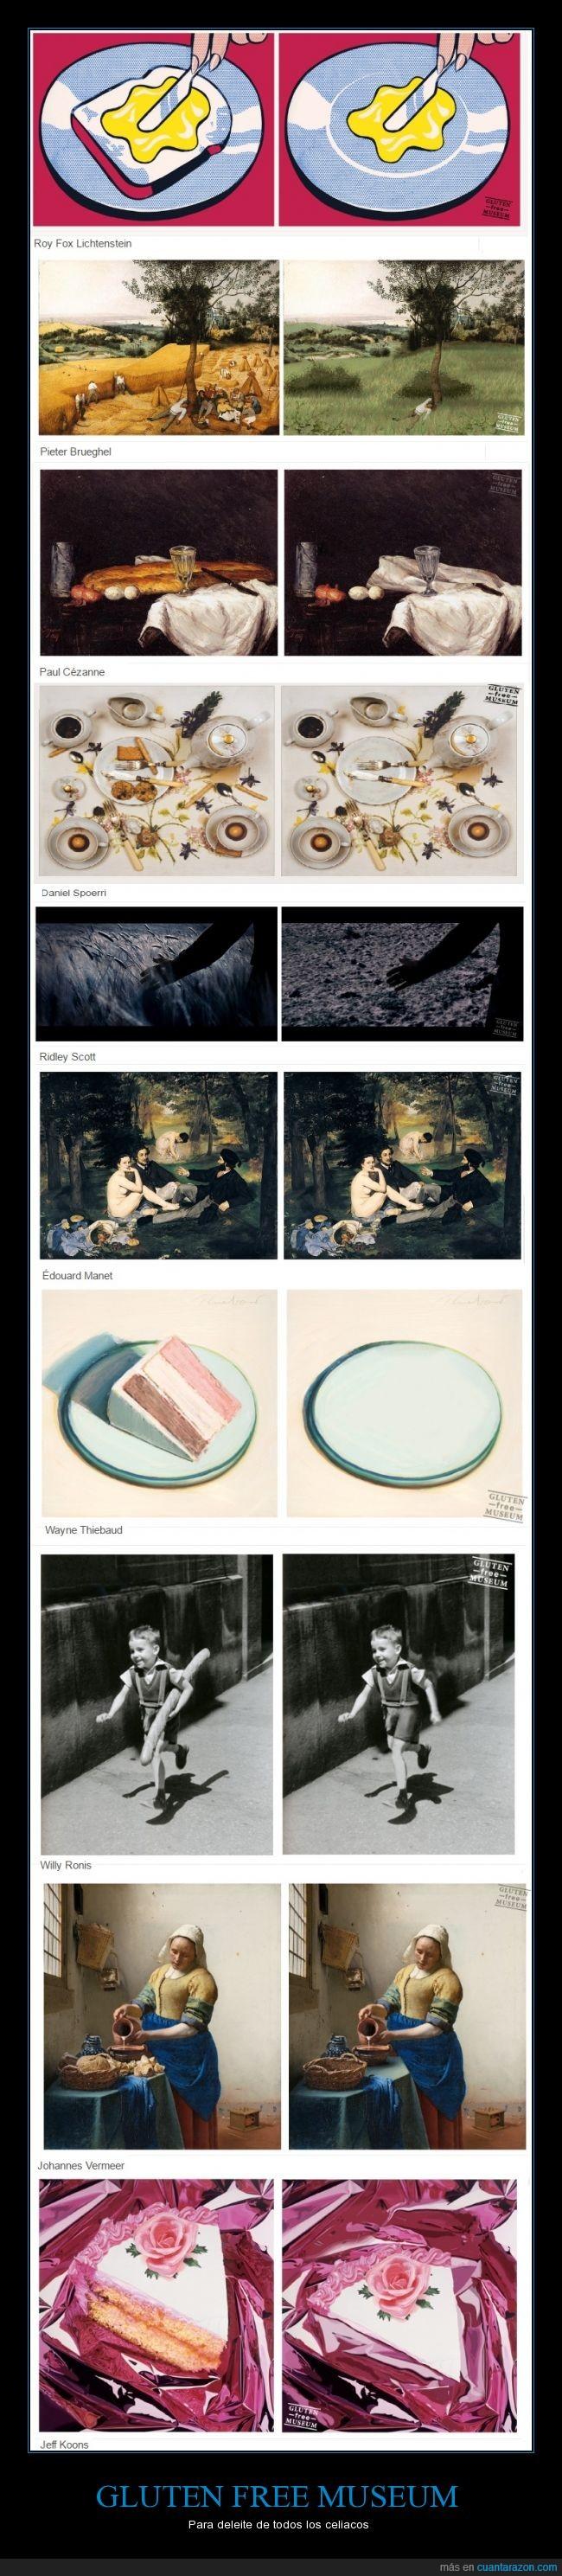 artistas,celiacos,Gluten,museo,pan,sin